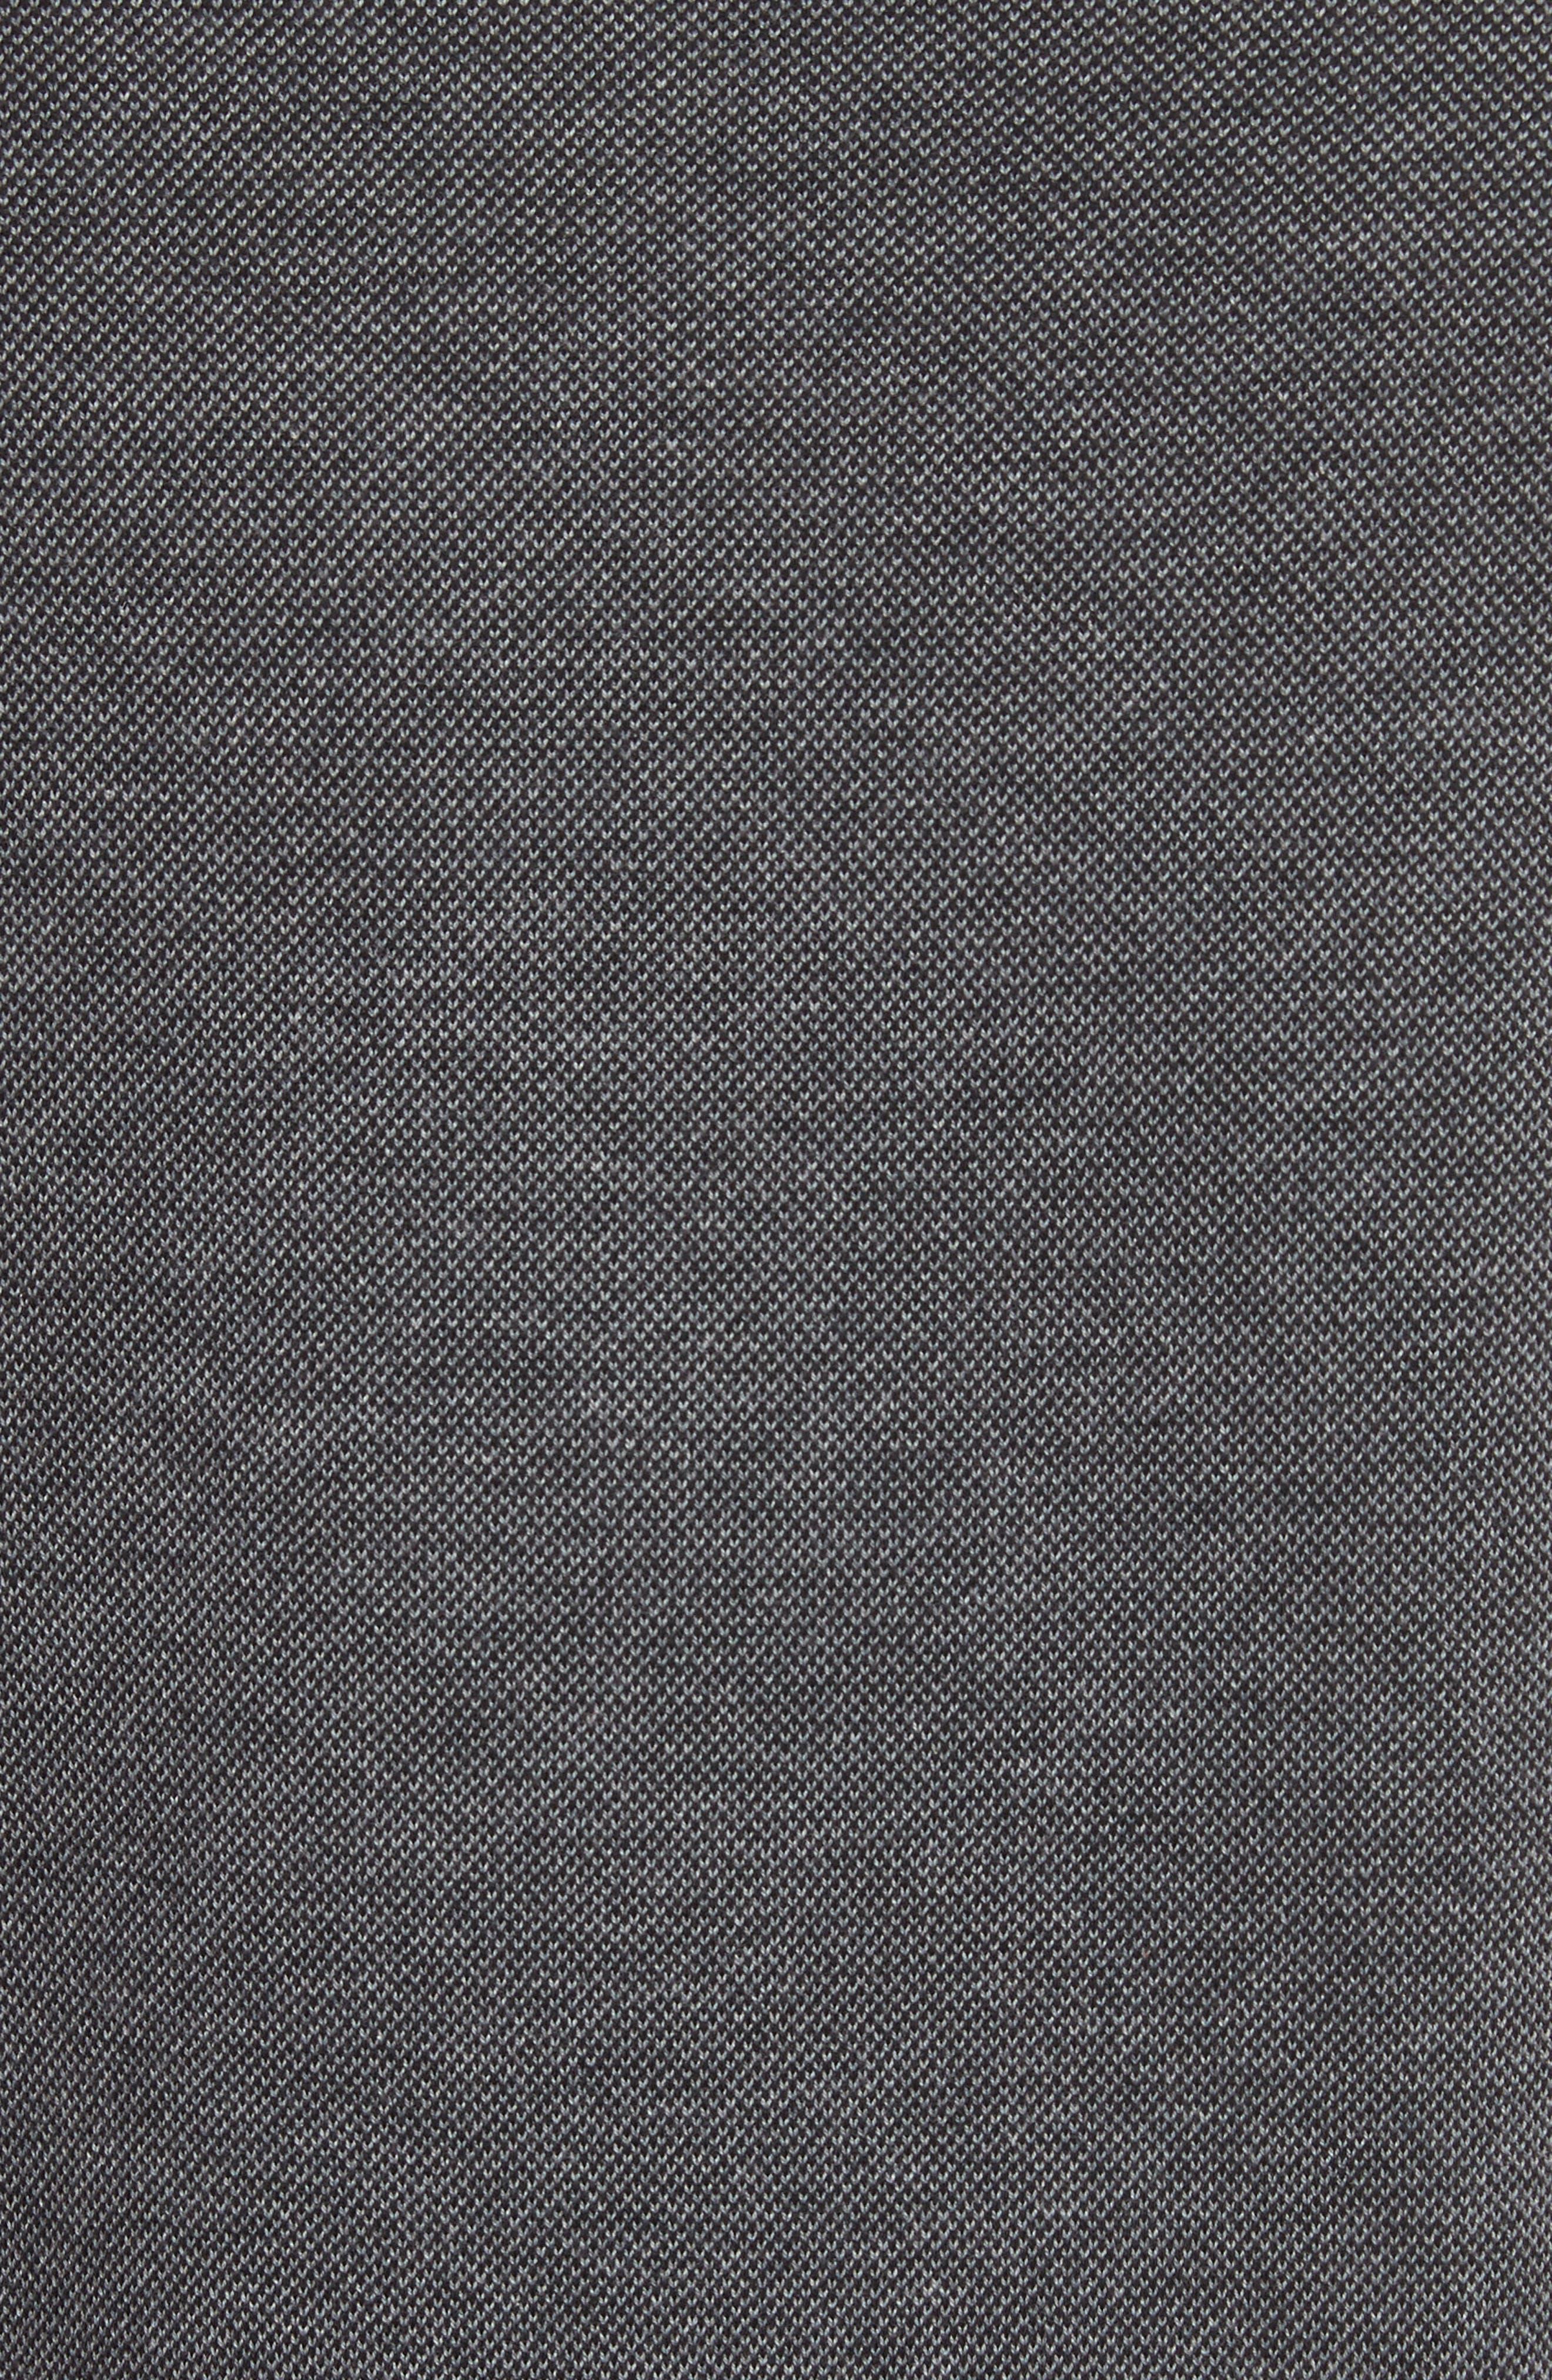 Textured Cotton Sweatshirt,                             Alternate thumbnail 5, color,                             020